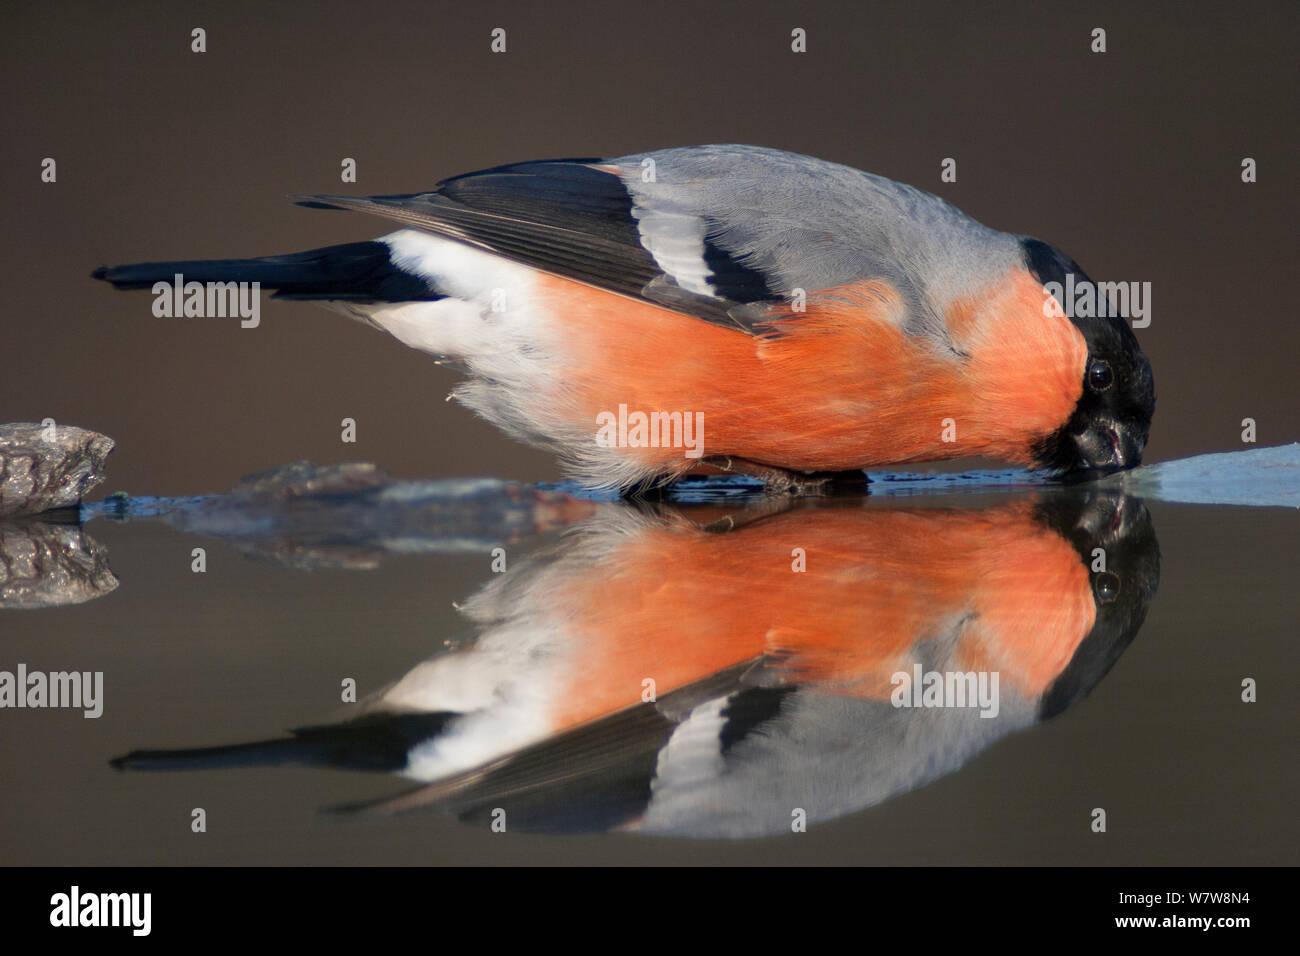 Eurasian bullfinch (Pyrrhula pyrrhula) drinking, reflected in water, Pusztaszer, Hungary, February. Stock Photo